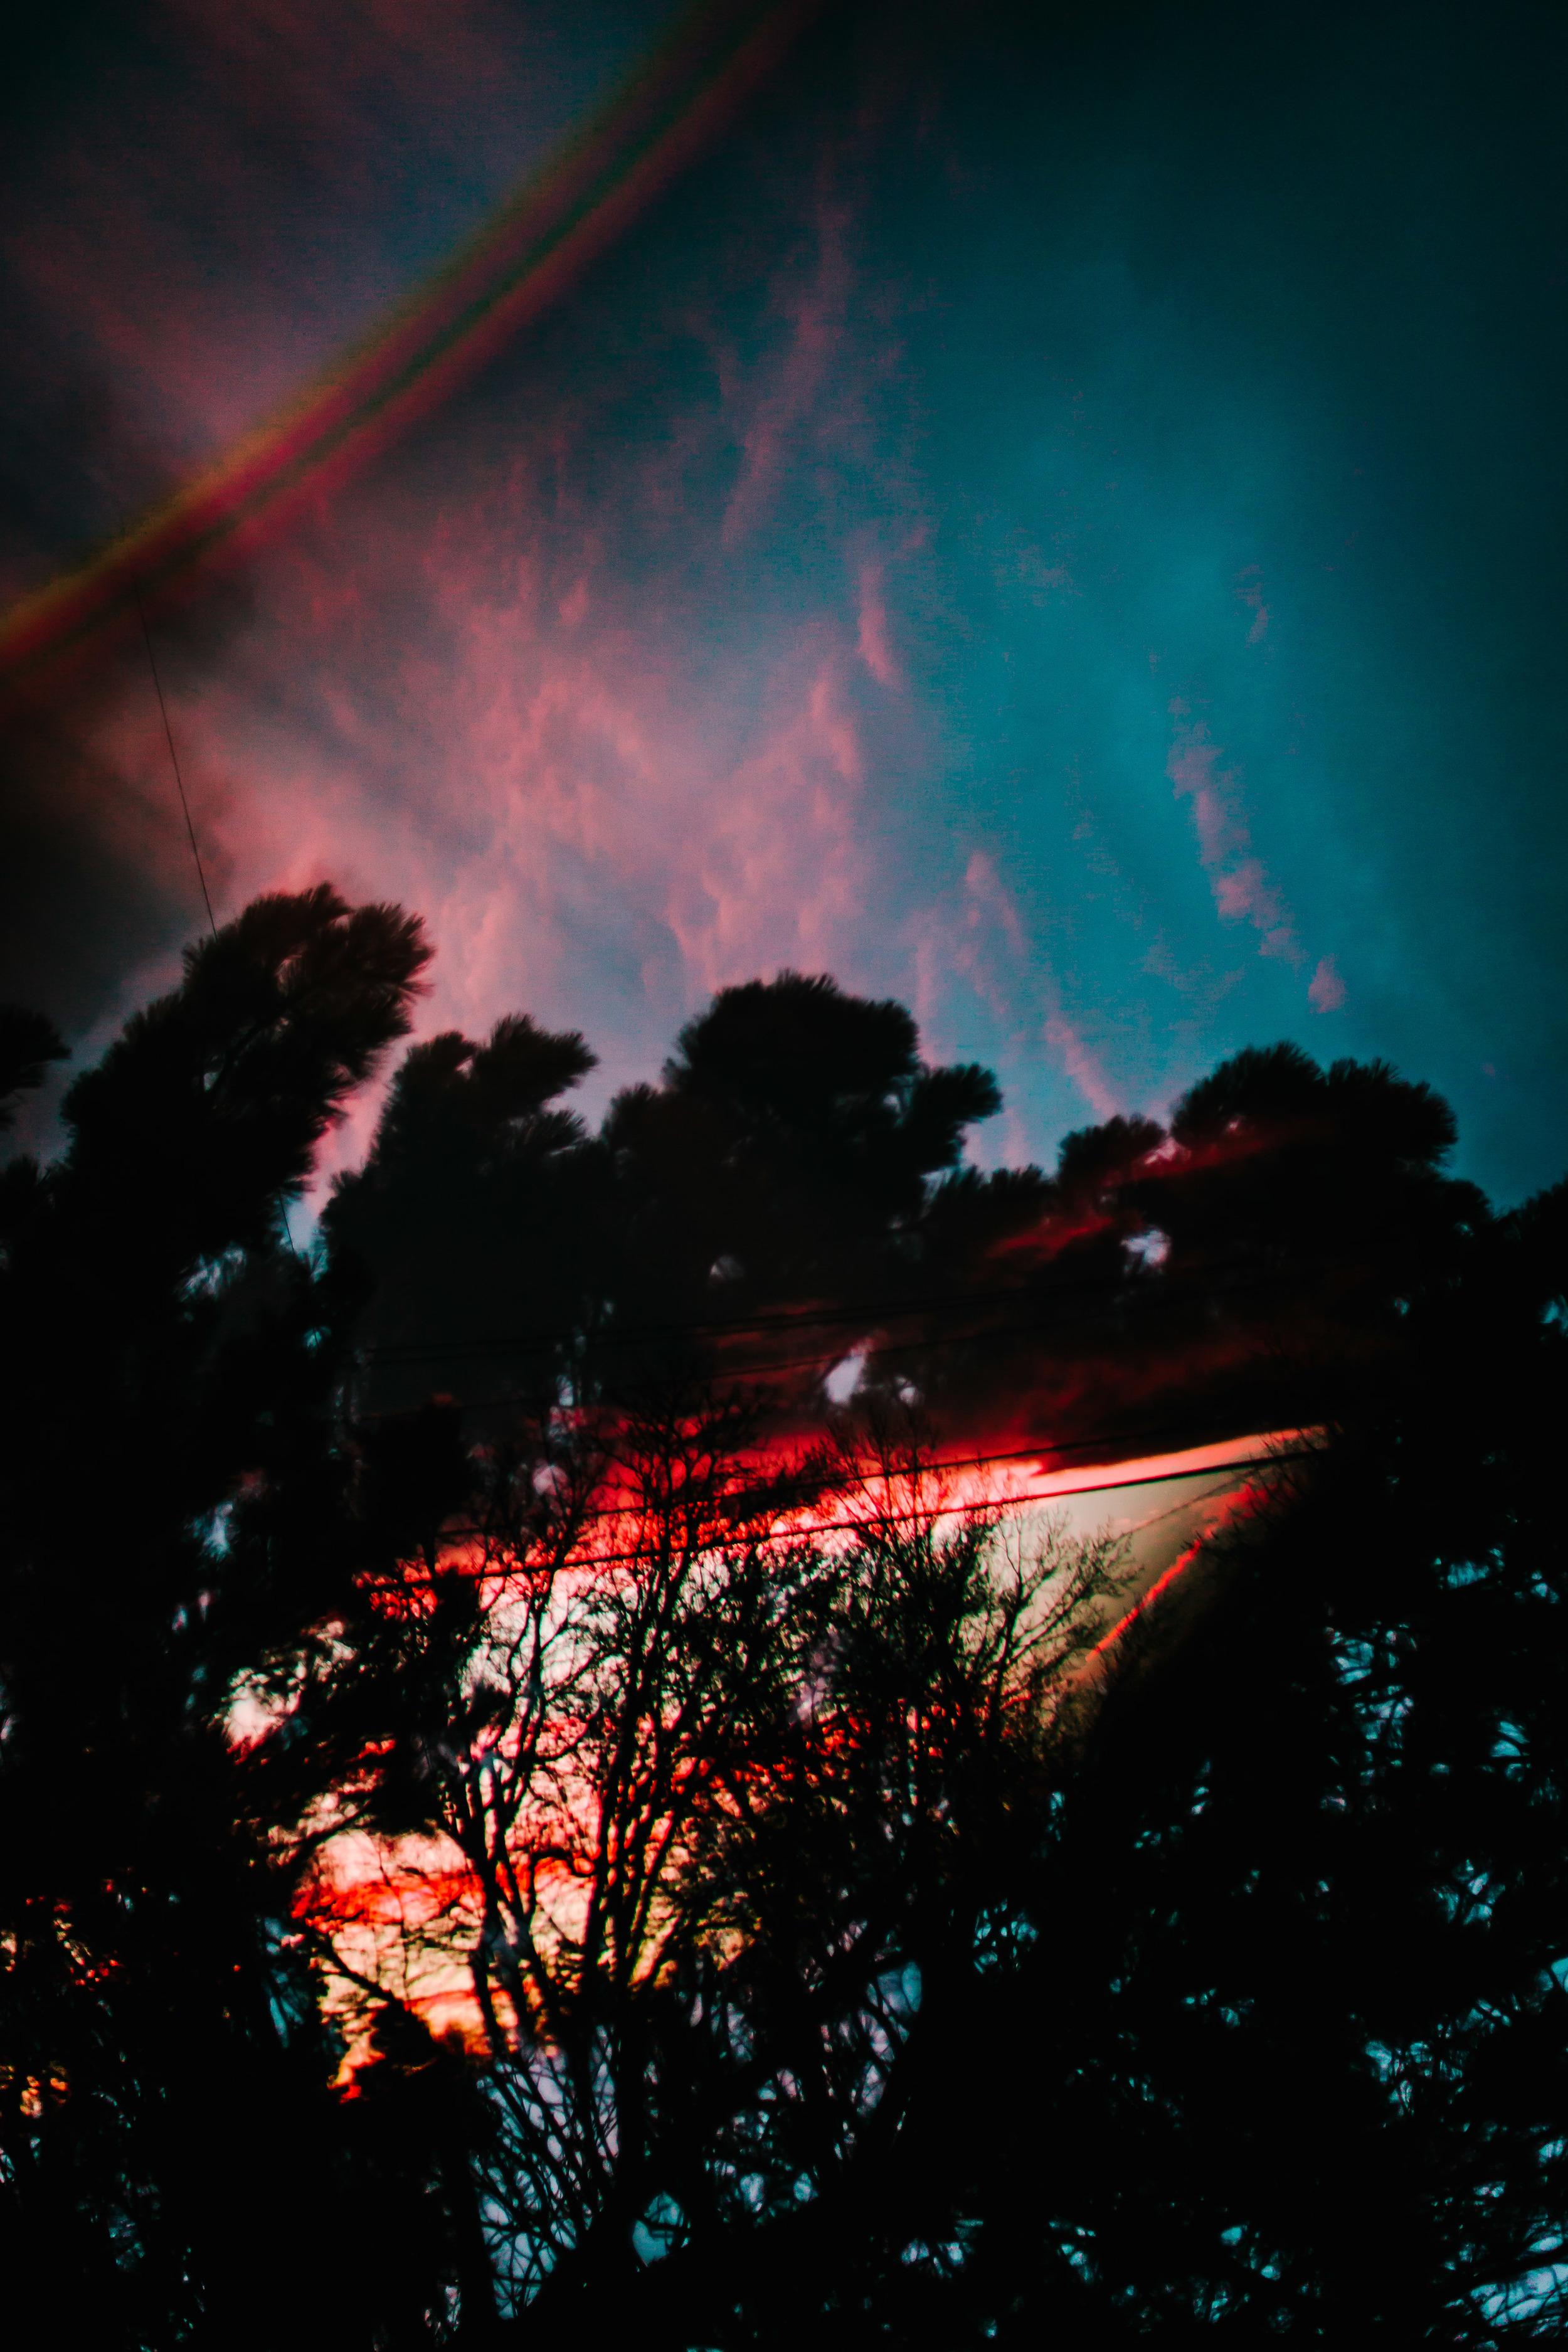 backyard experimentations-2.jpg